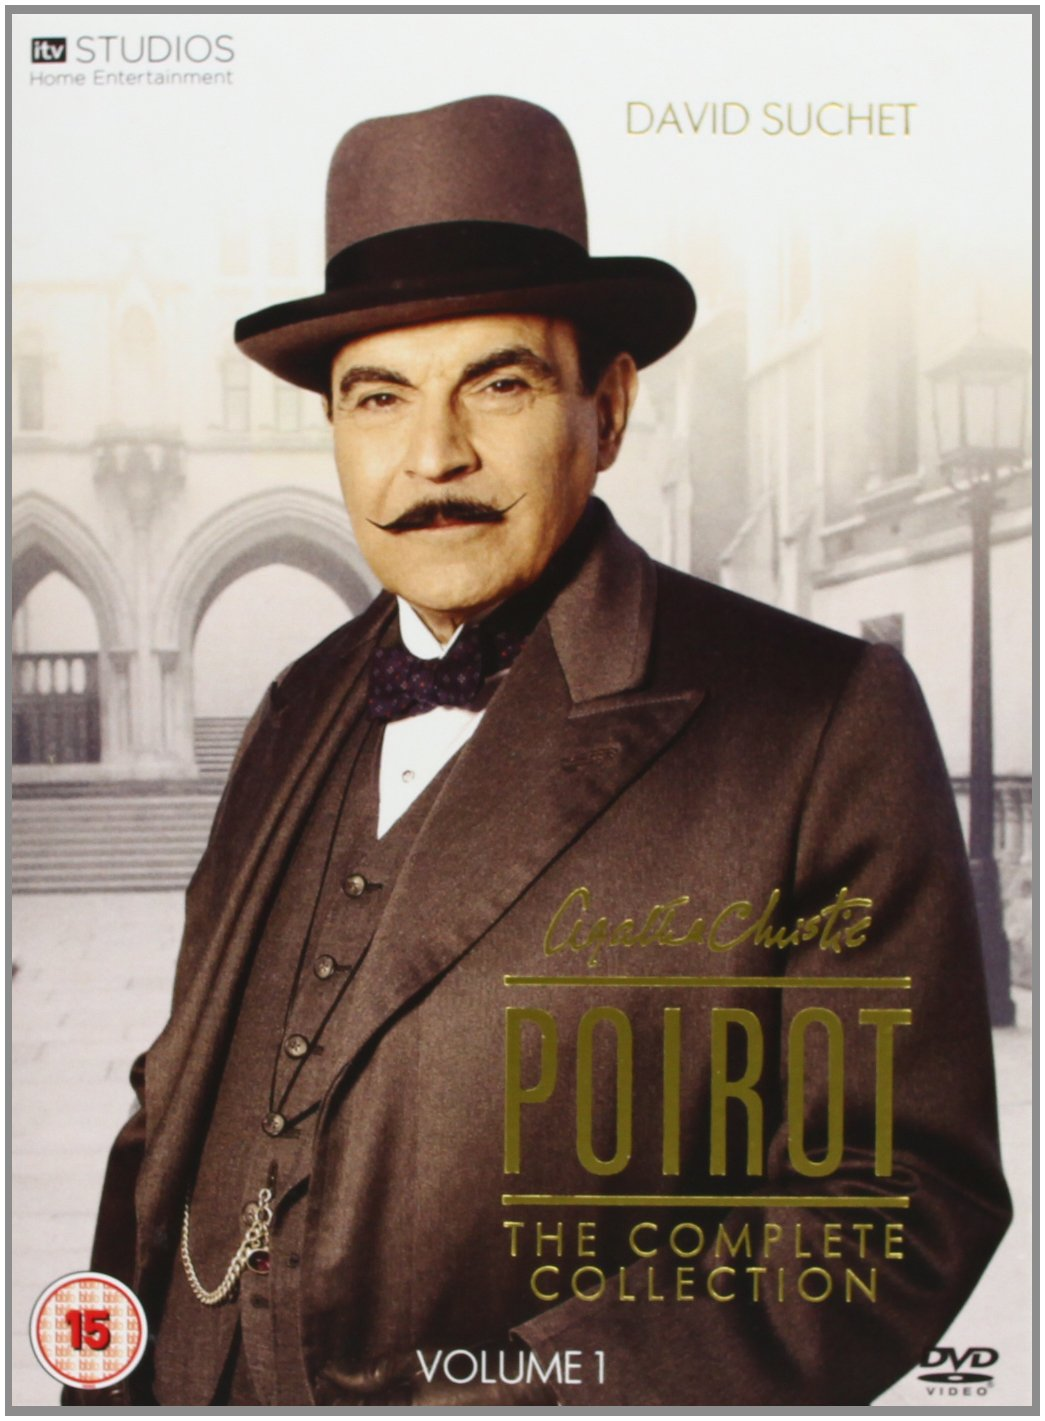 Agatha christie s poirot the complete series 1 12 32 dvd region 2 pal uk import amazon ca dvd